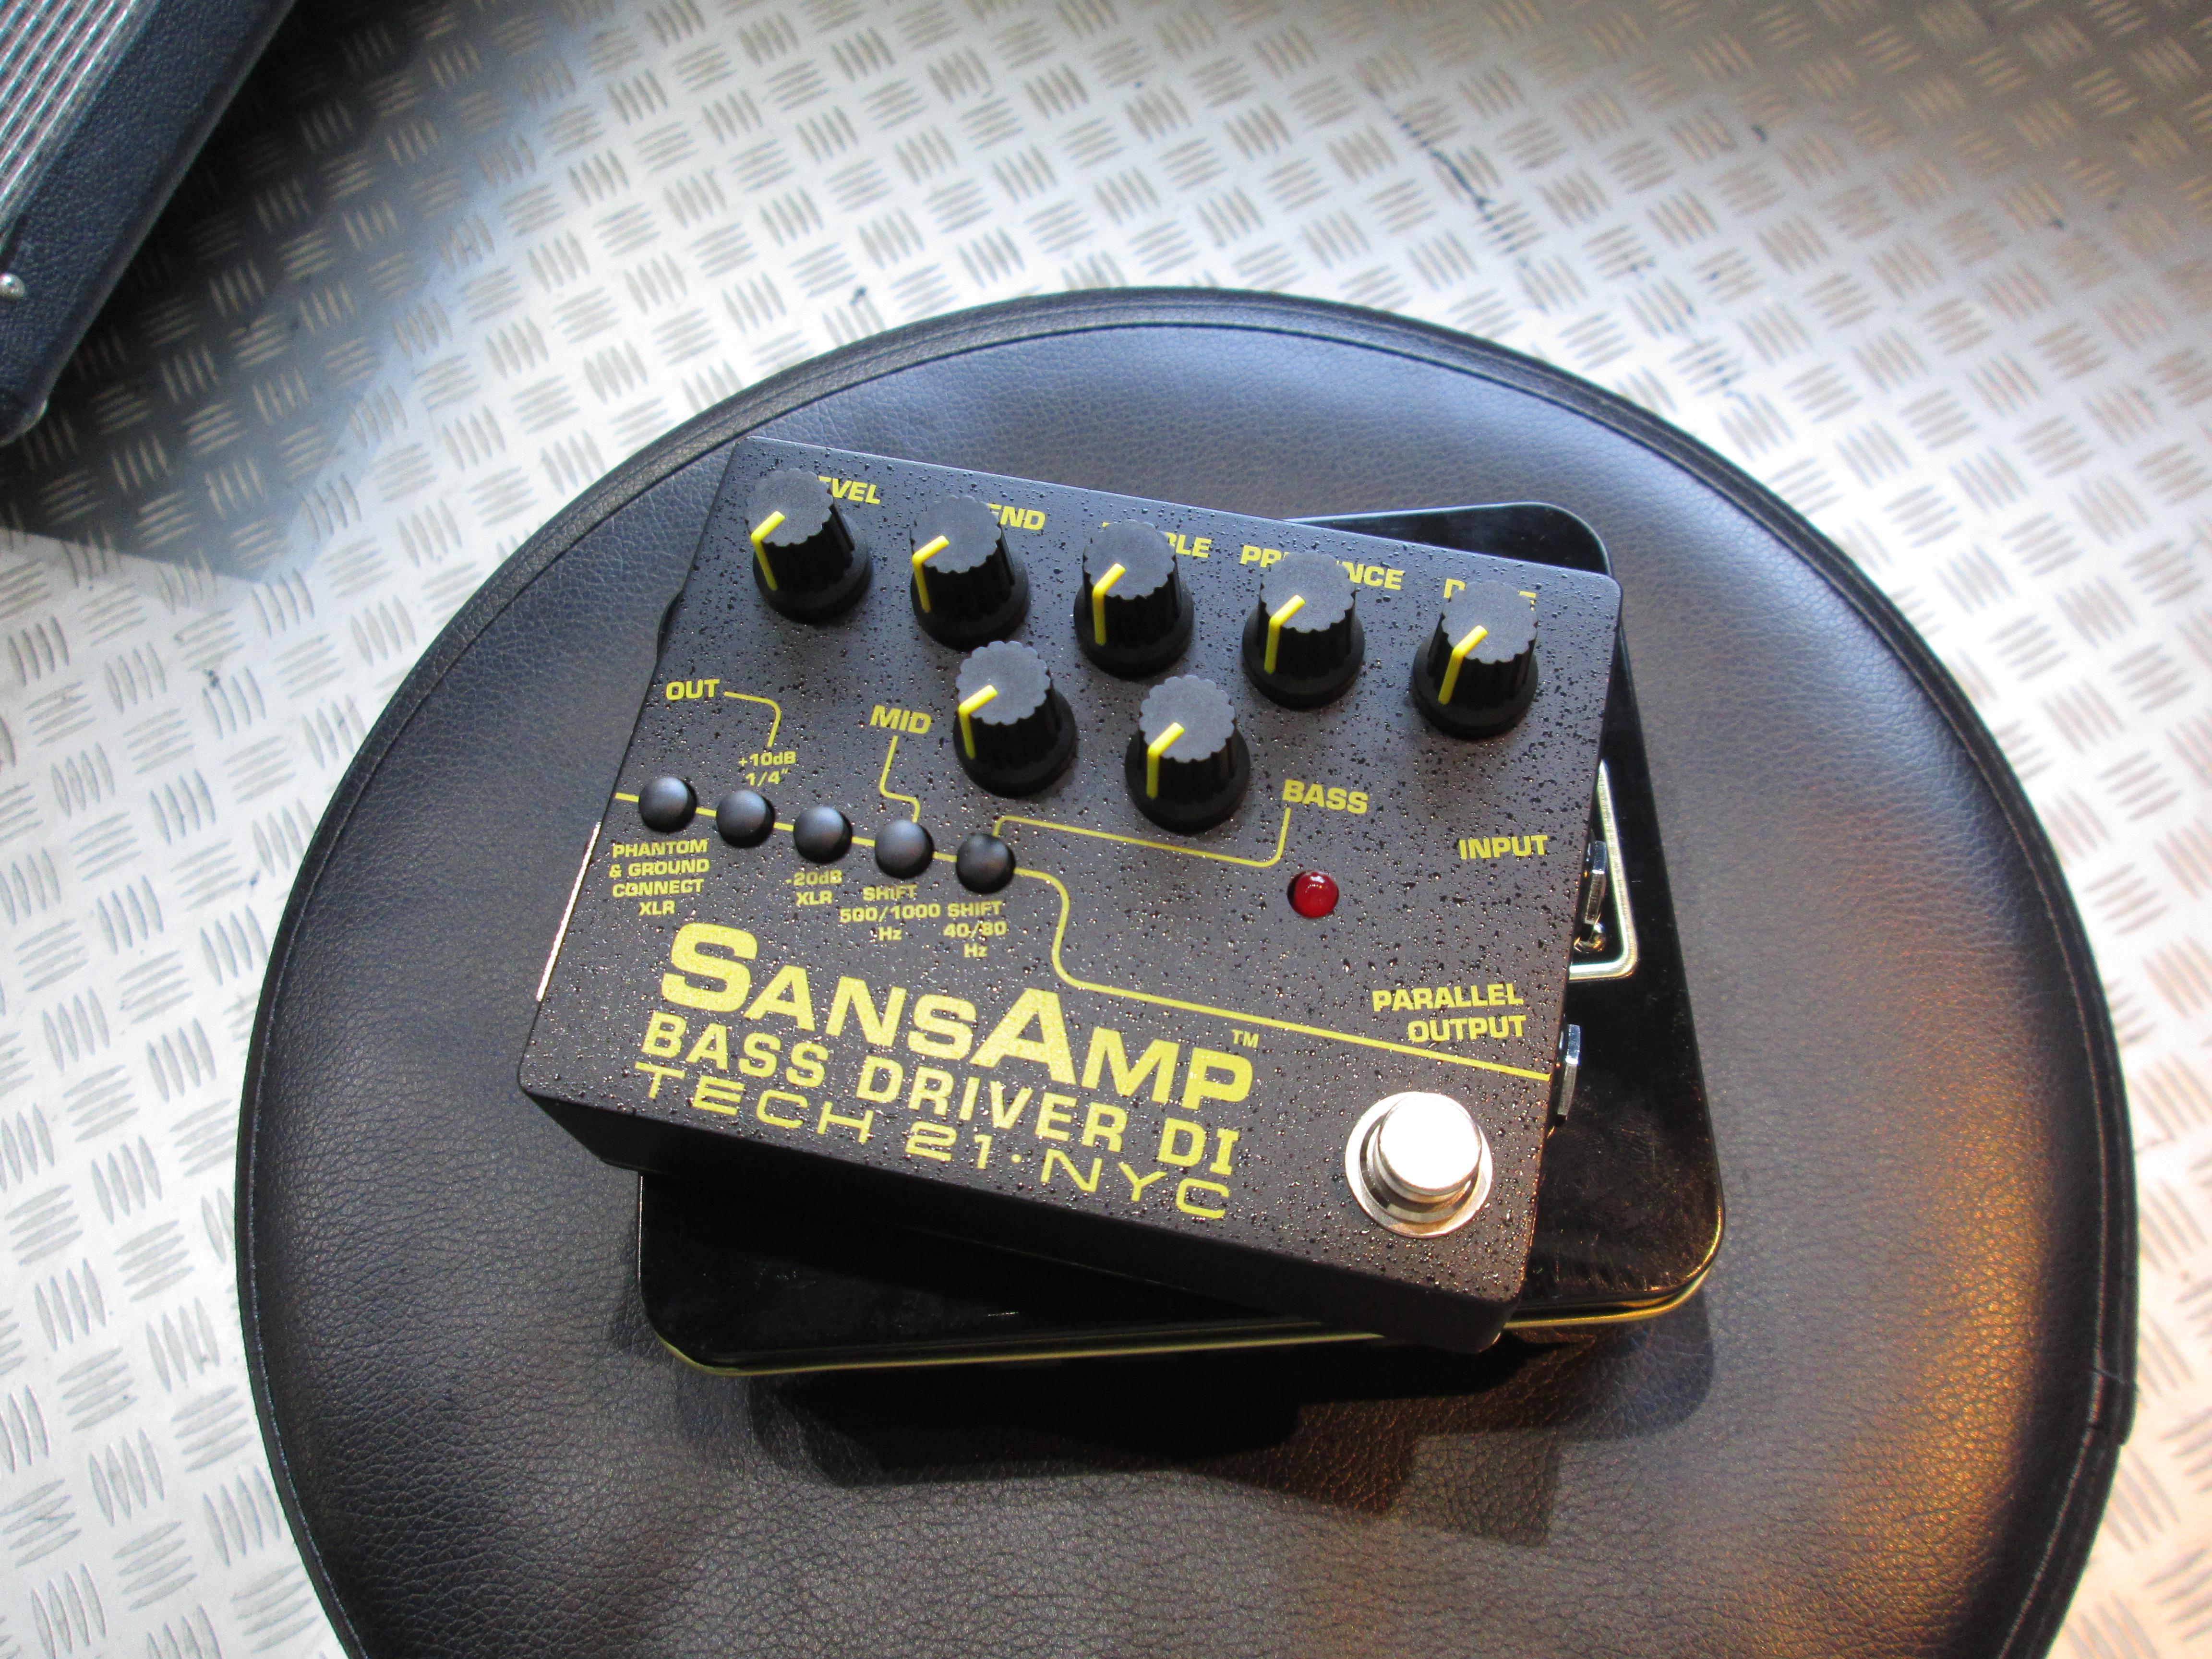 TECH21/SANS AMP BASS DRIVER DI ver.2 【定番プリアンプの最新作をレビュー!】